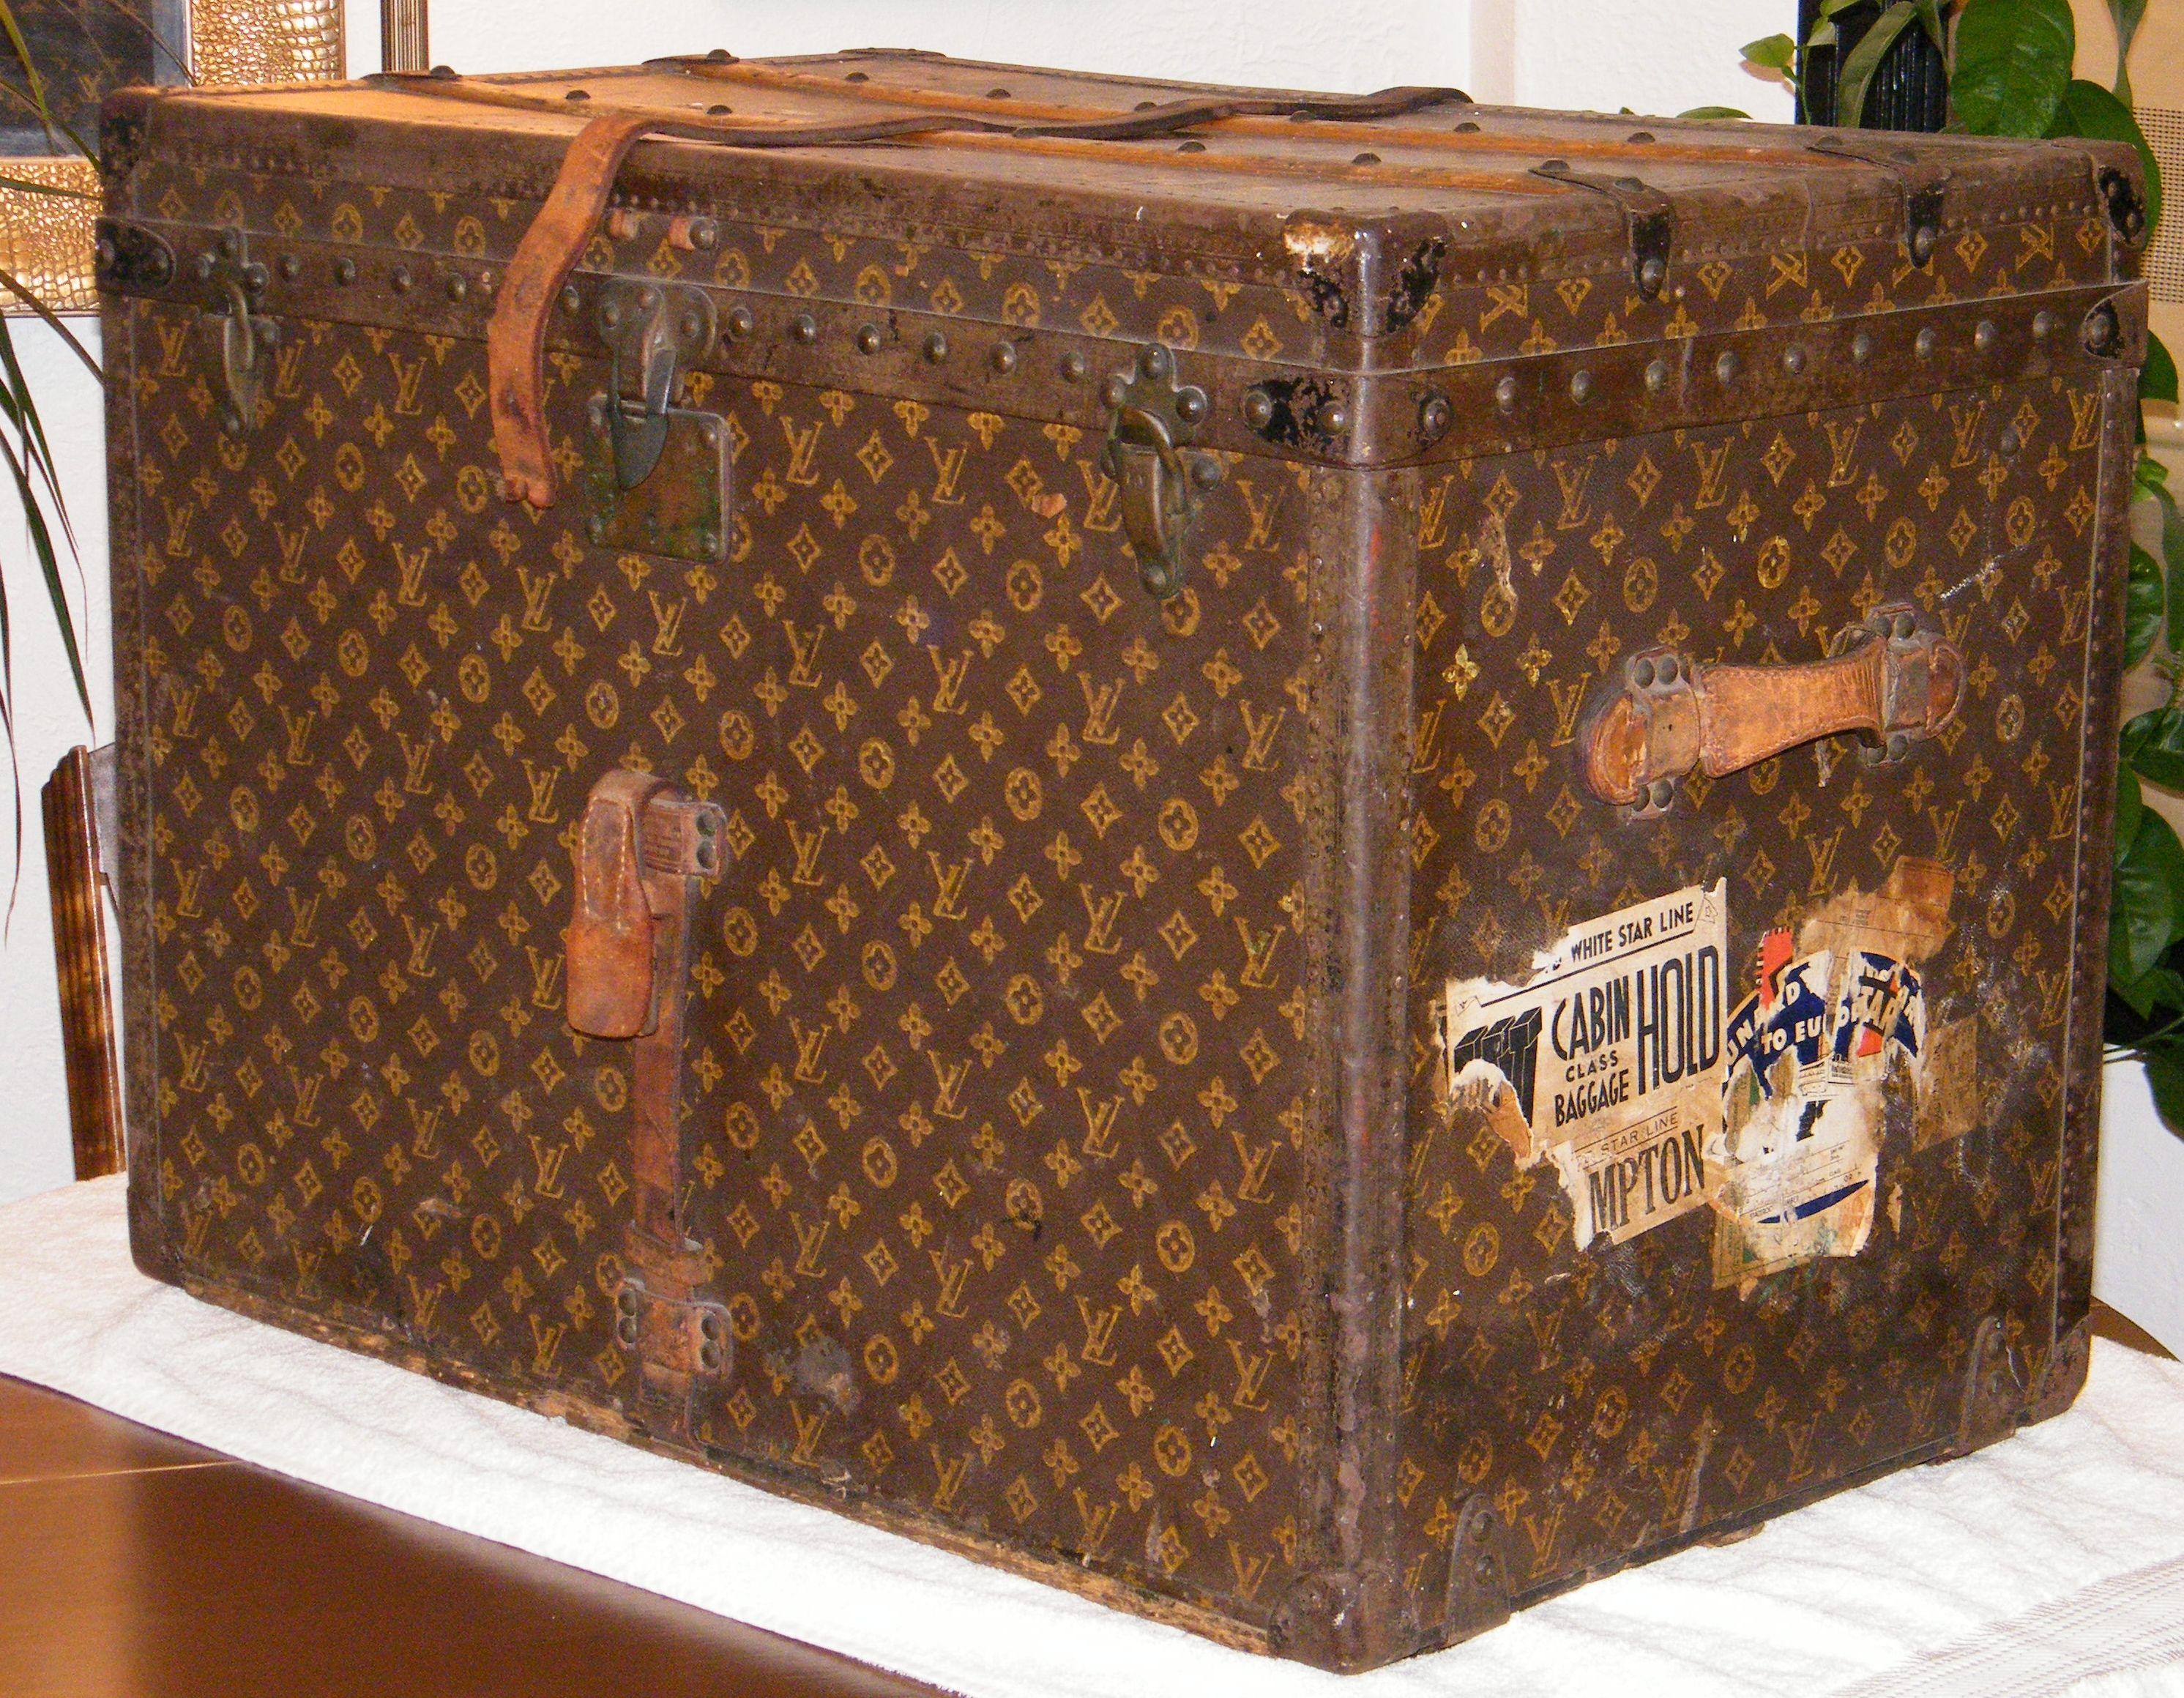 vintage louis vuitton luggage - Google Search | Louis Vuitton ...